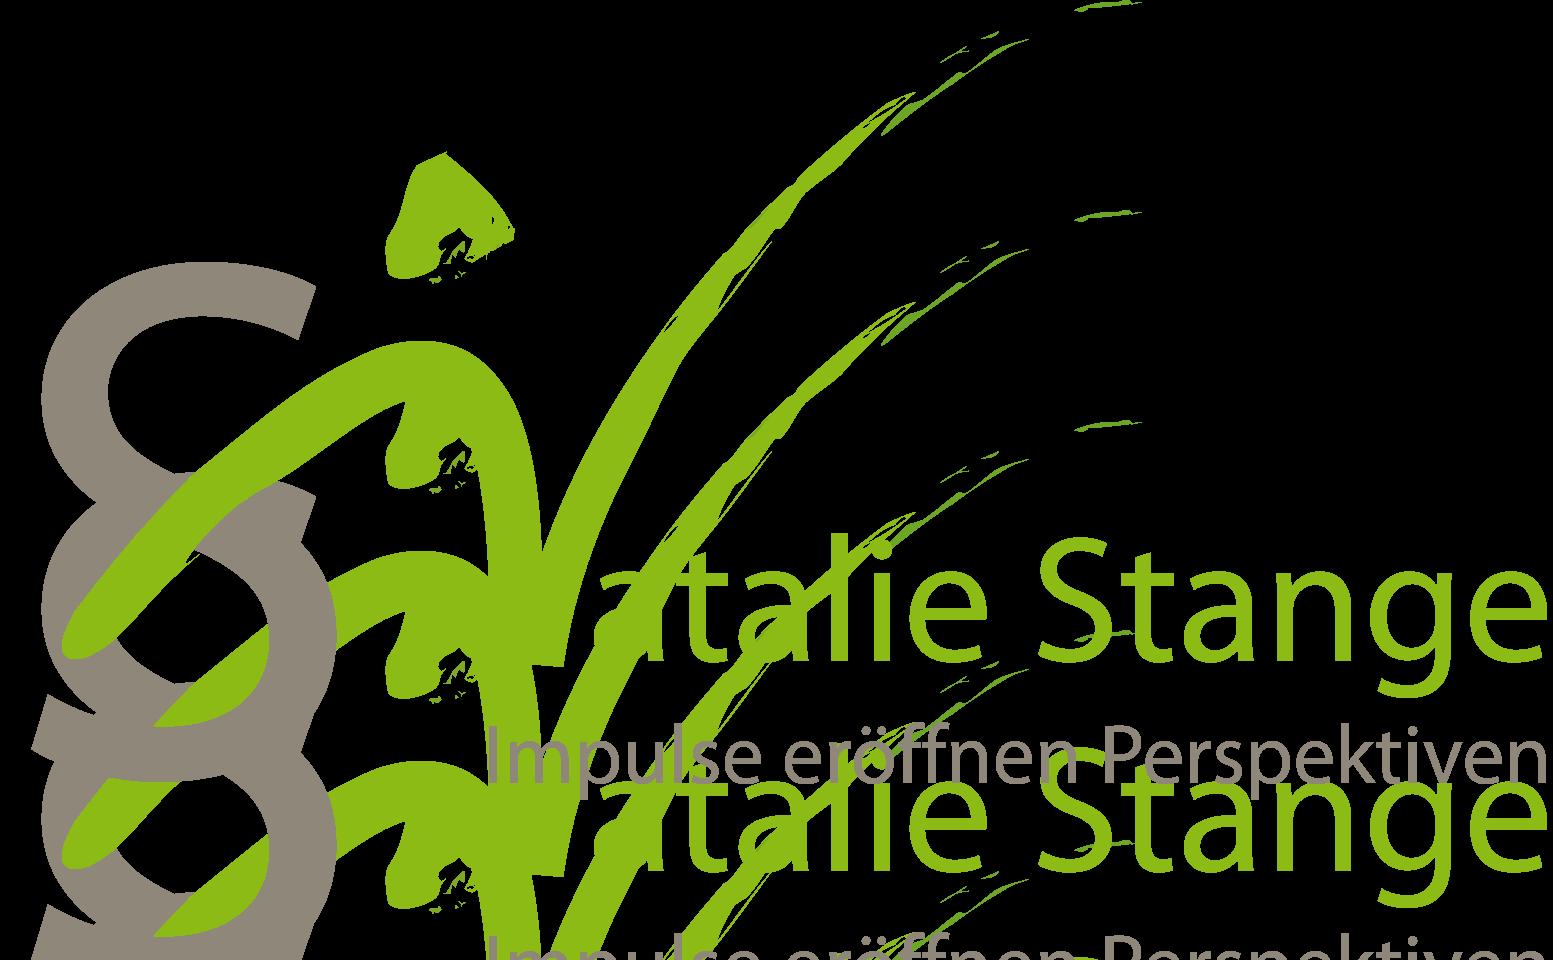 Natalie Stange